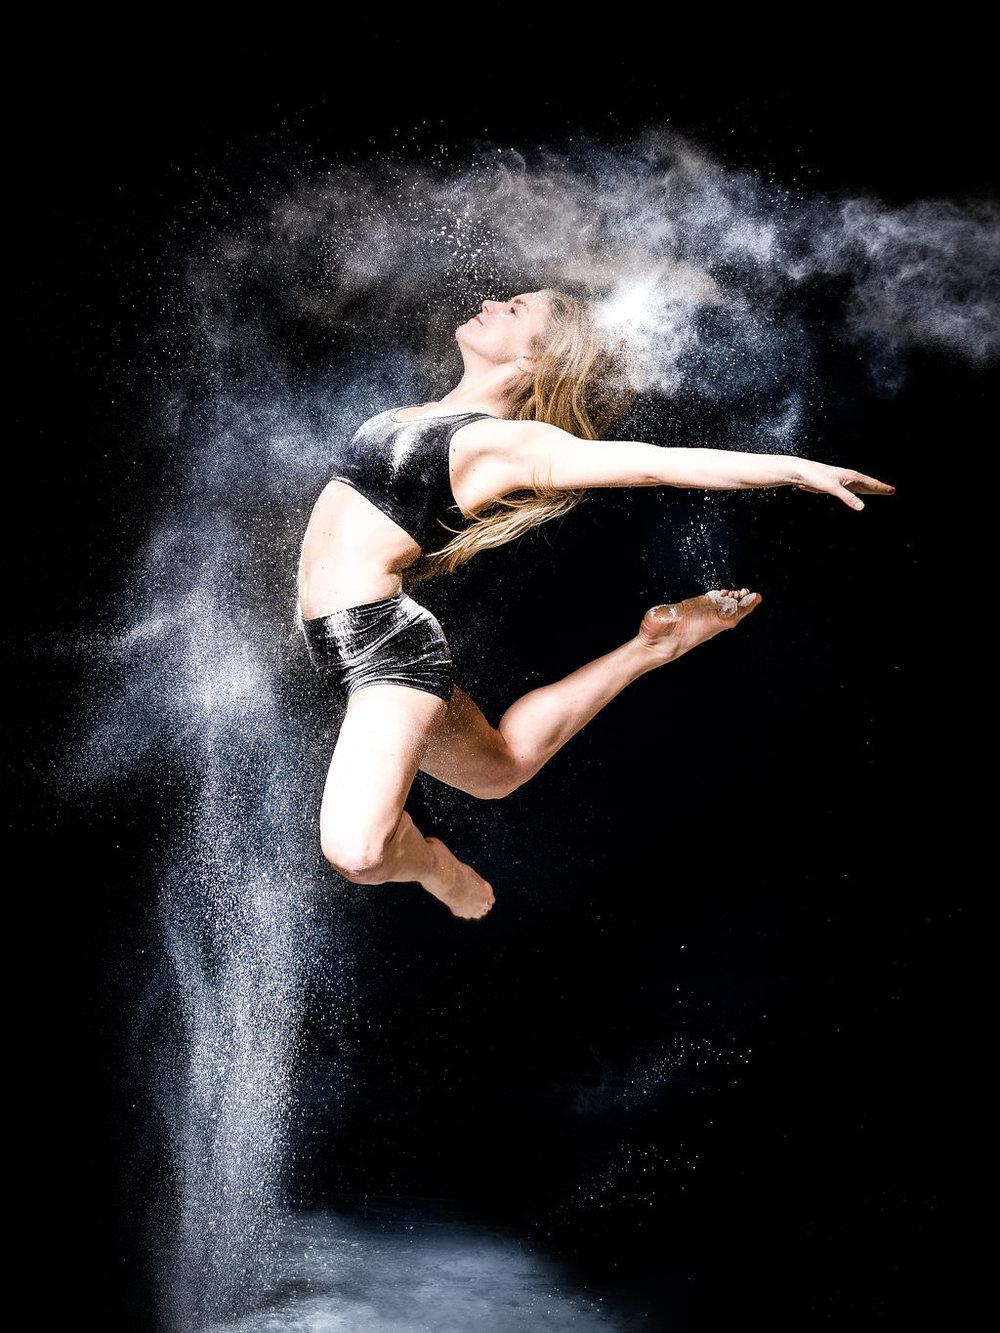 fotograf-dans-ballett-12-010-Edit.jpg